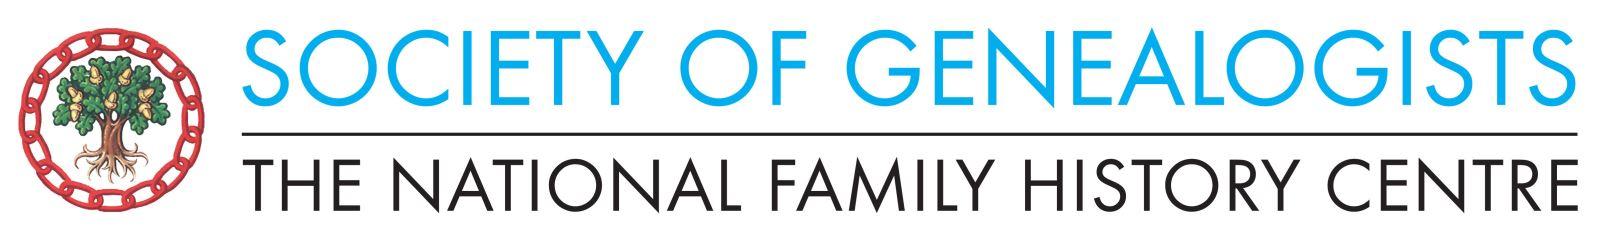 Society of Genealogists